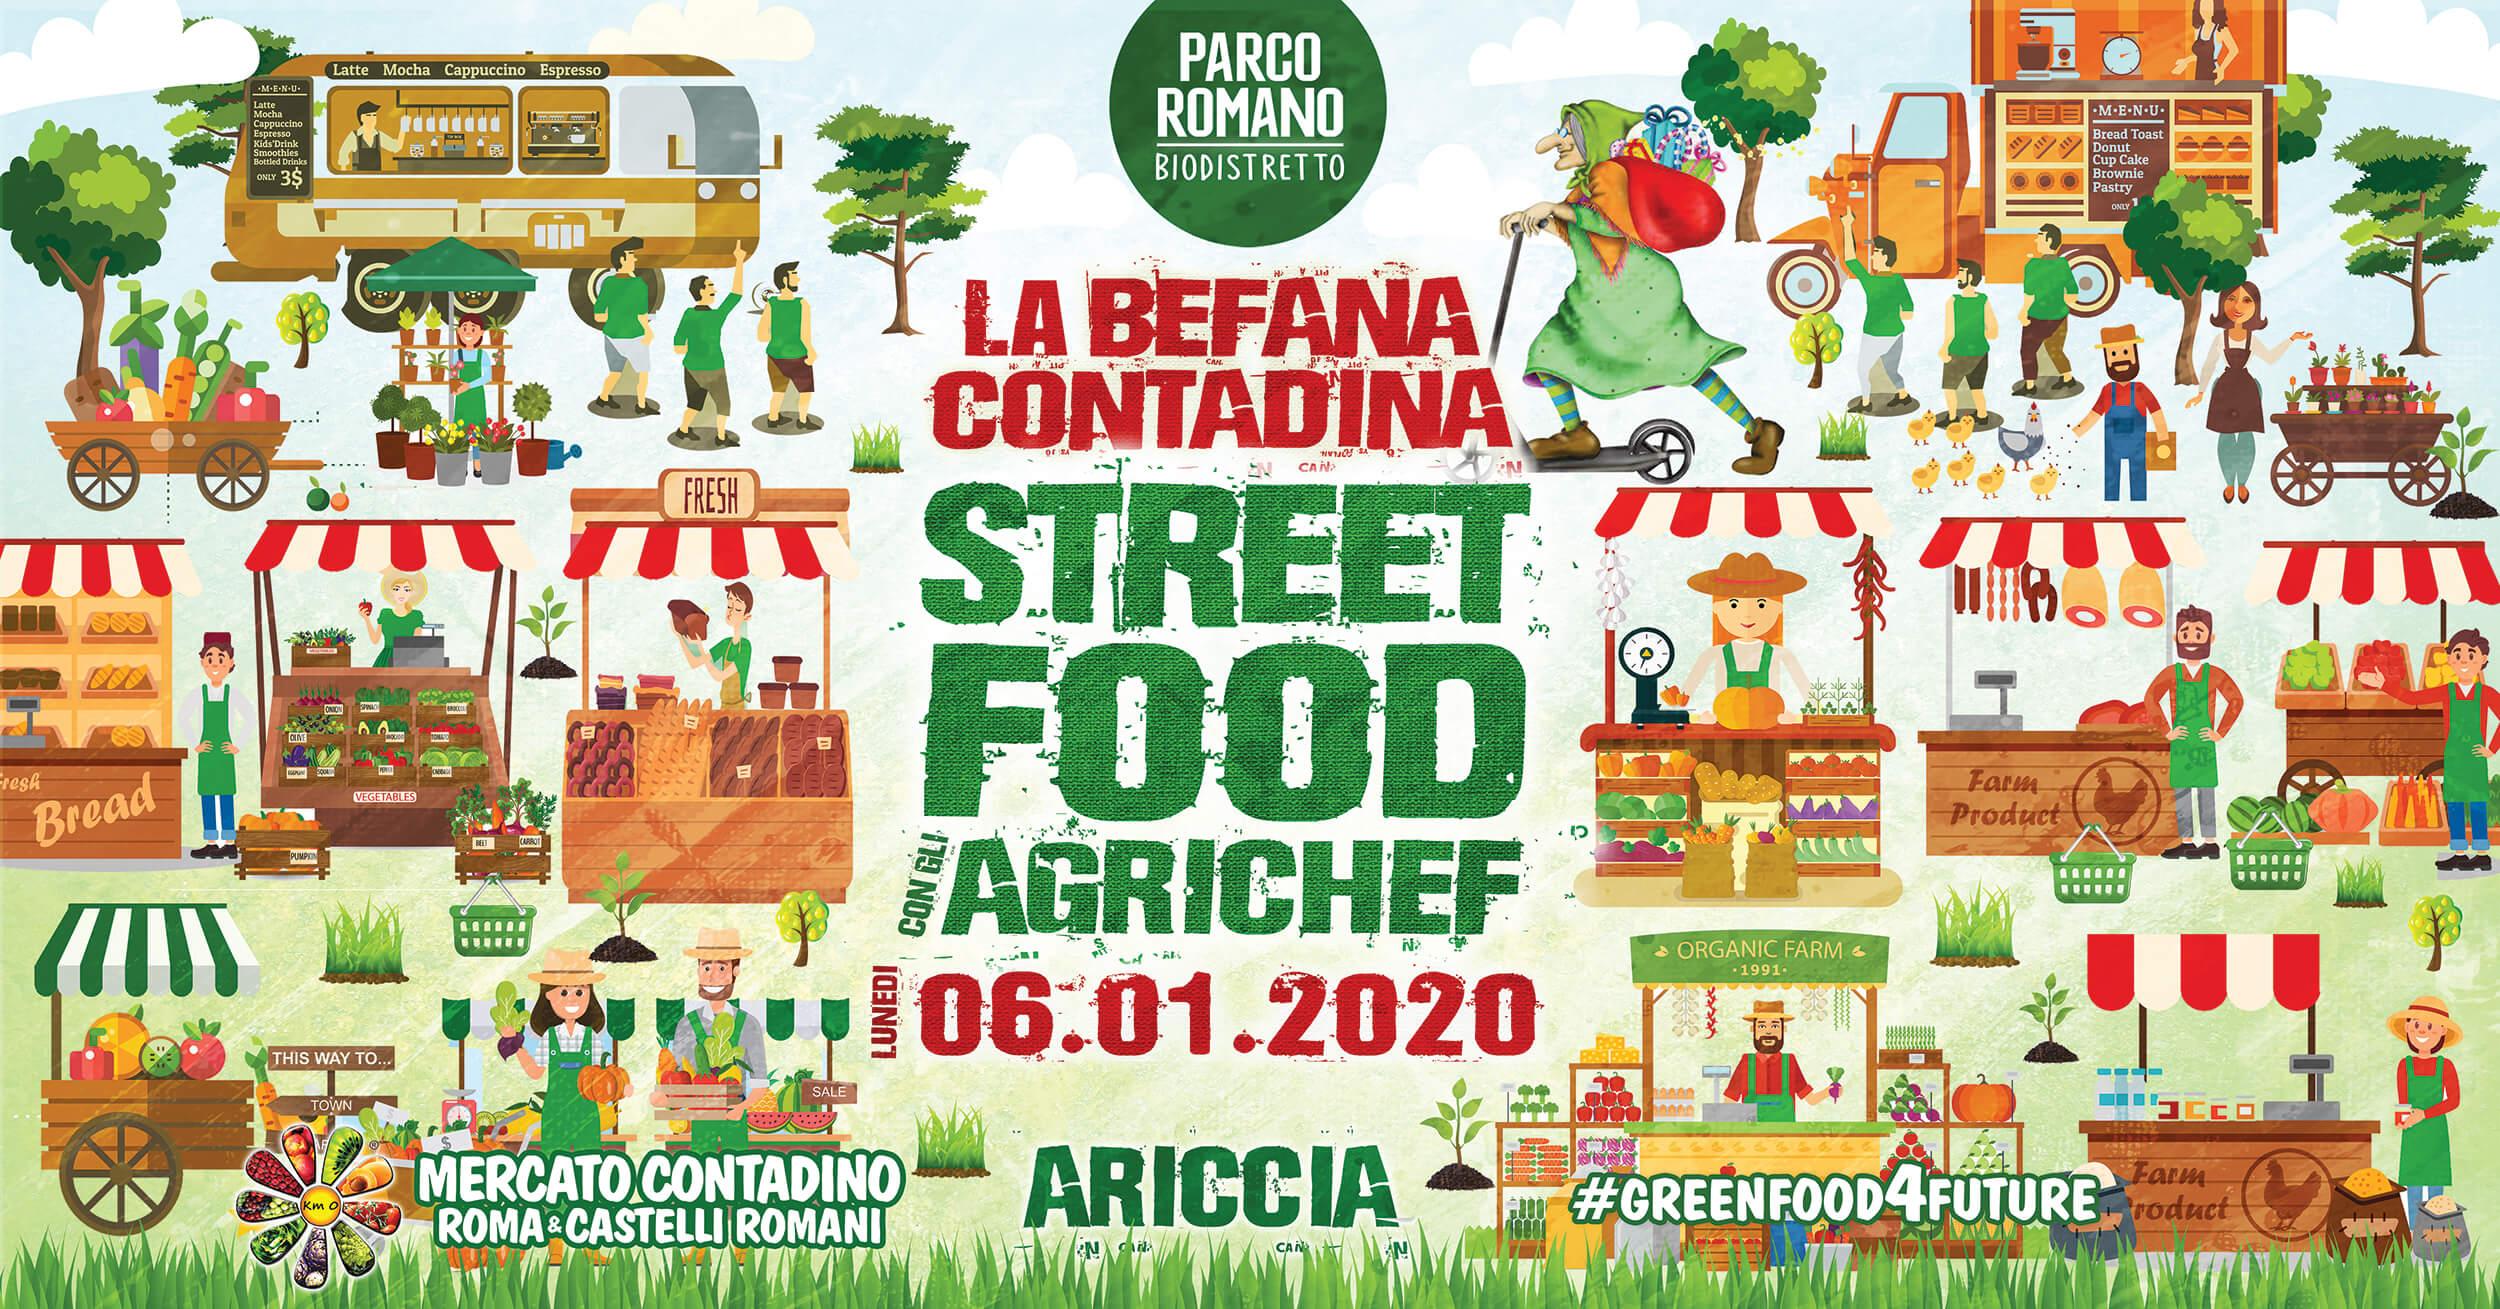 Evento Befana street food agrichef ariccia castelli romani 2020